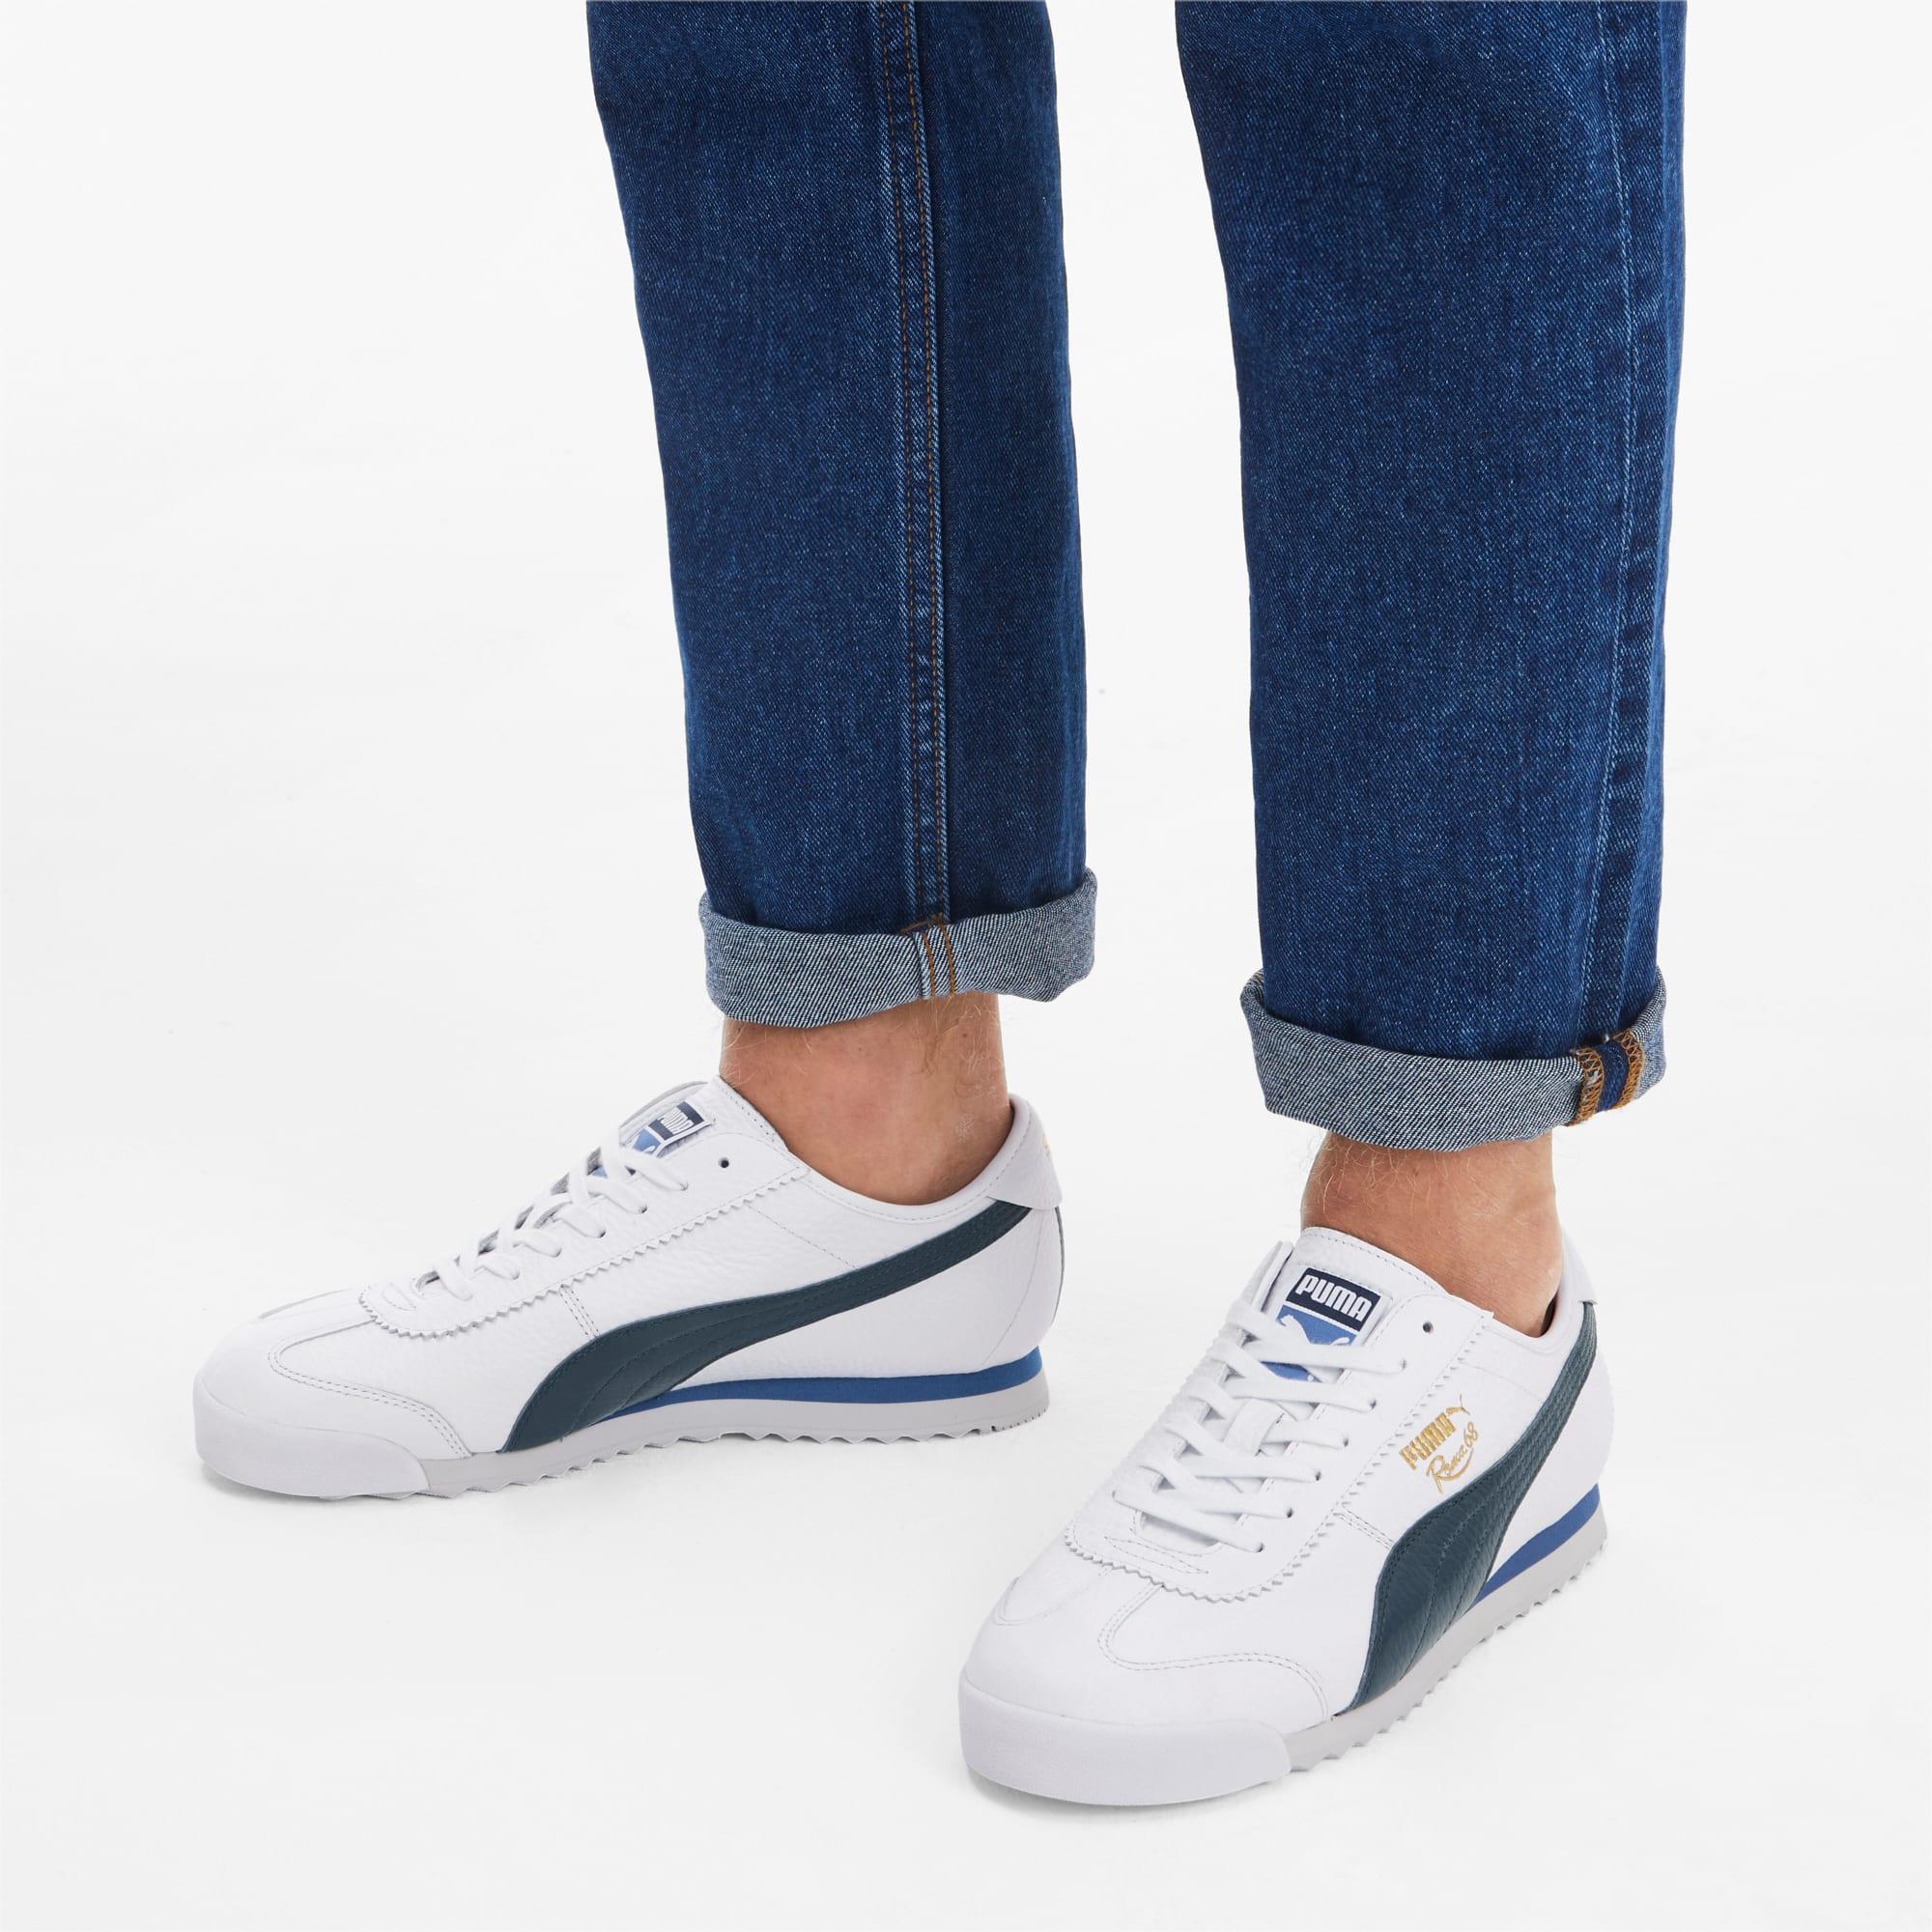 Puma Roma Vintage shoes